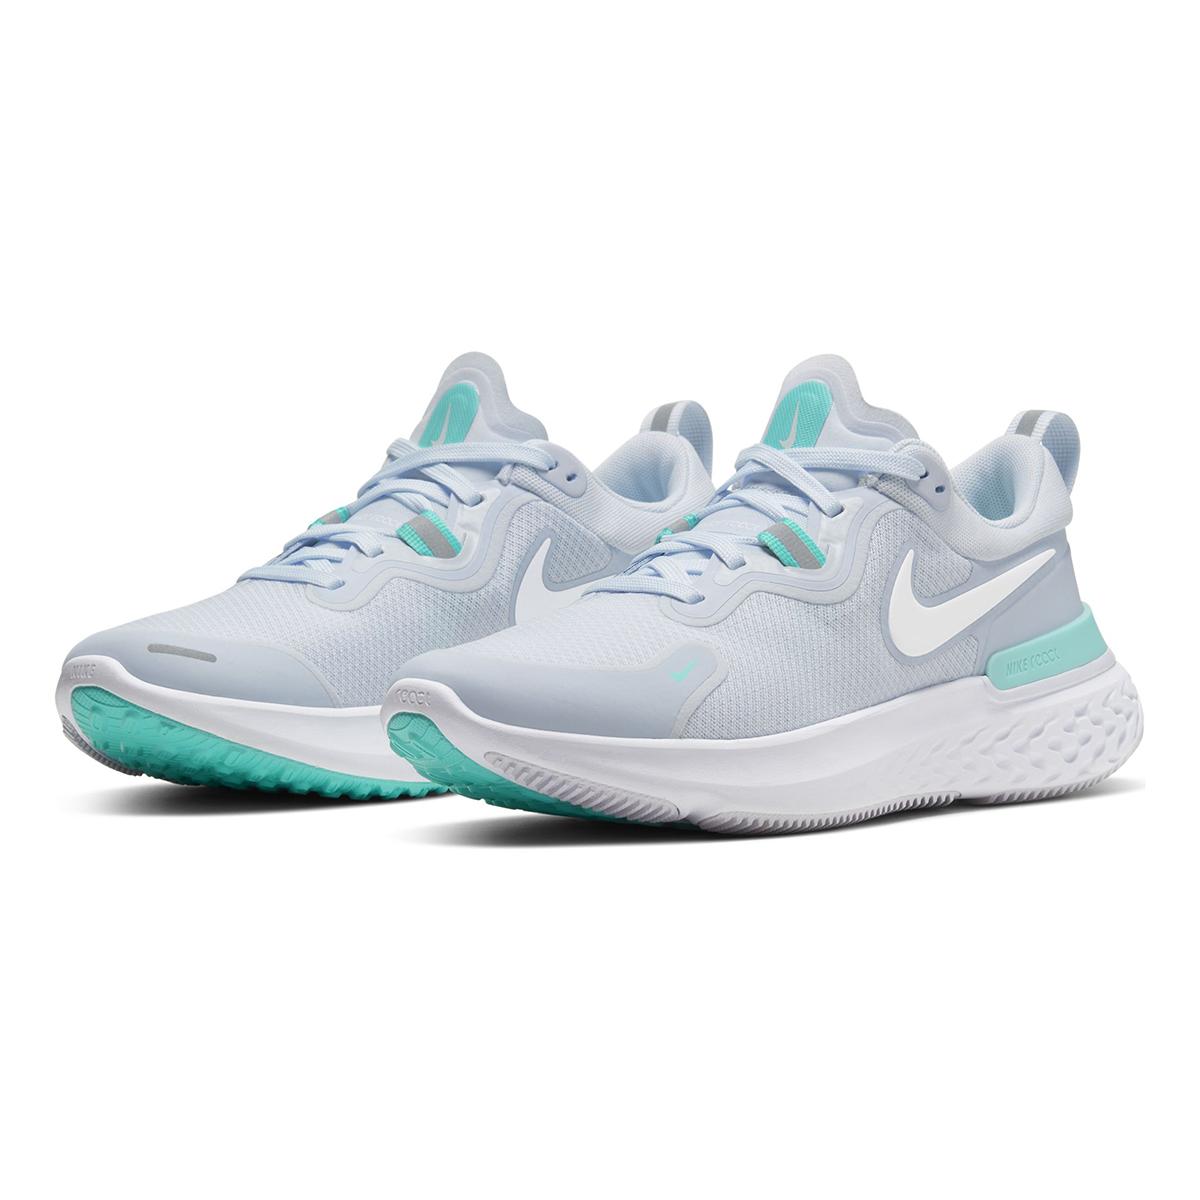 Women's Nike React Miler Running Shoe - Color: Football Grey/Aurora Green/White (Regular Width) - Size: 5.5, Football Grey/Aurora Green/White, large, image 4